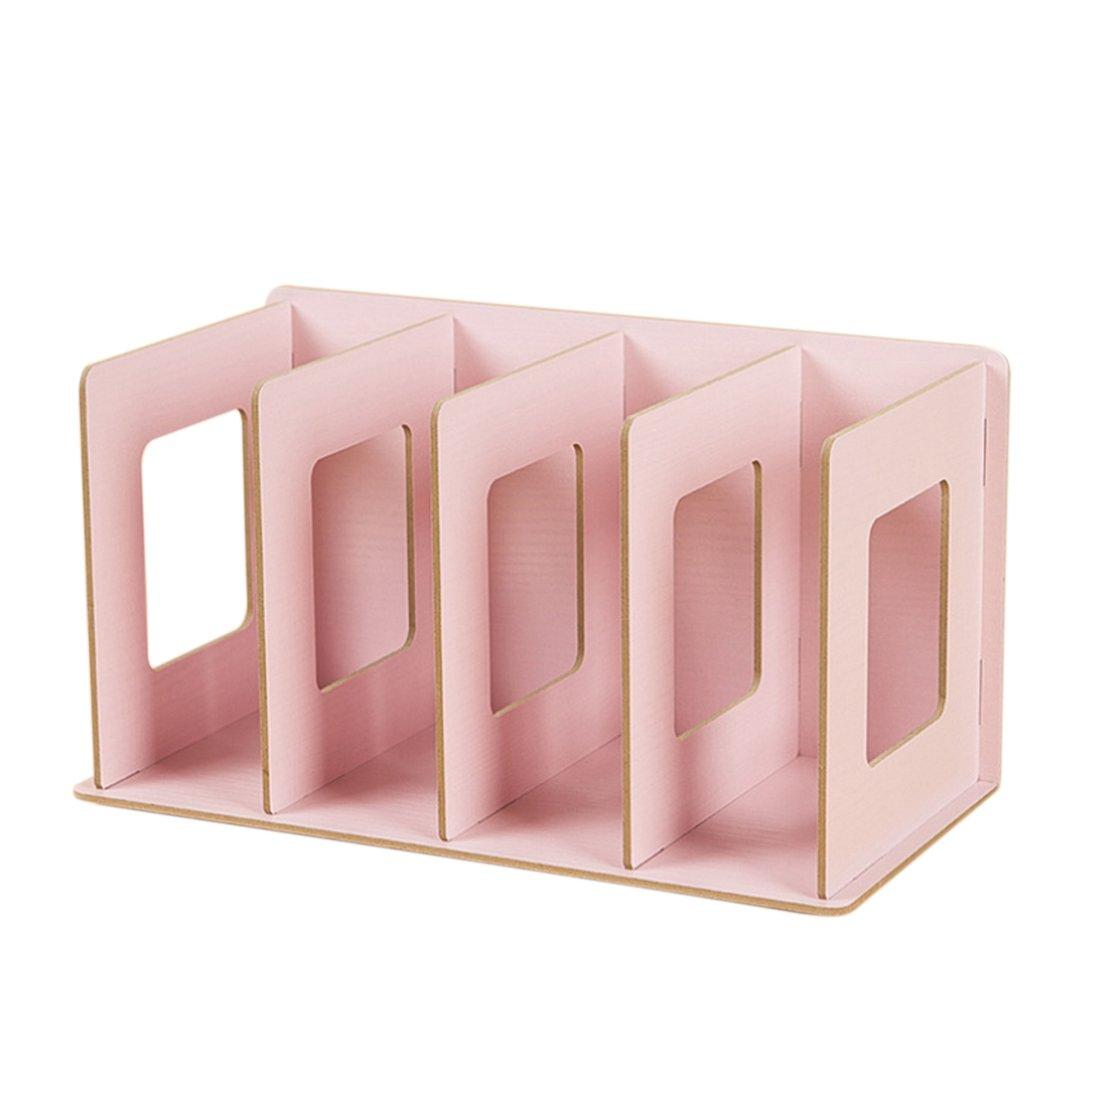 Katoot@ Creative Wooden DIY Desktop Book CD Storage Rack Holder Sorting Bookends Office Carrying Shelves Home Supplies (Pink)